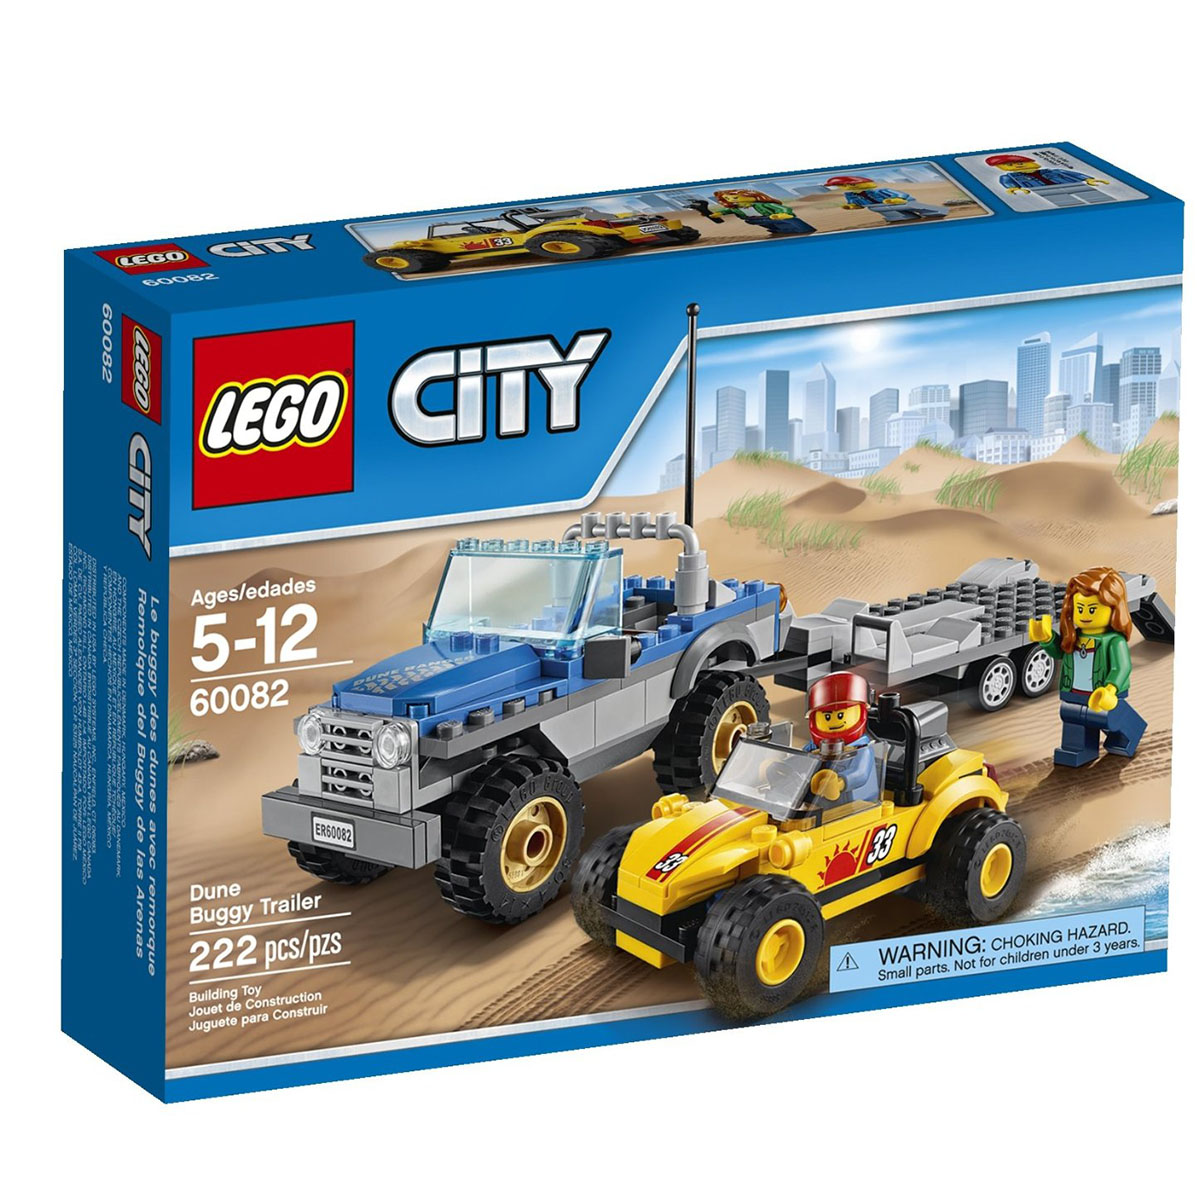 Do choi Lego City 60082 - Xe keo dia hinh